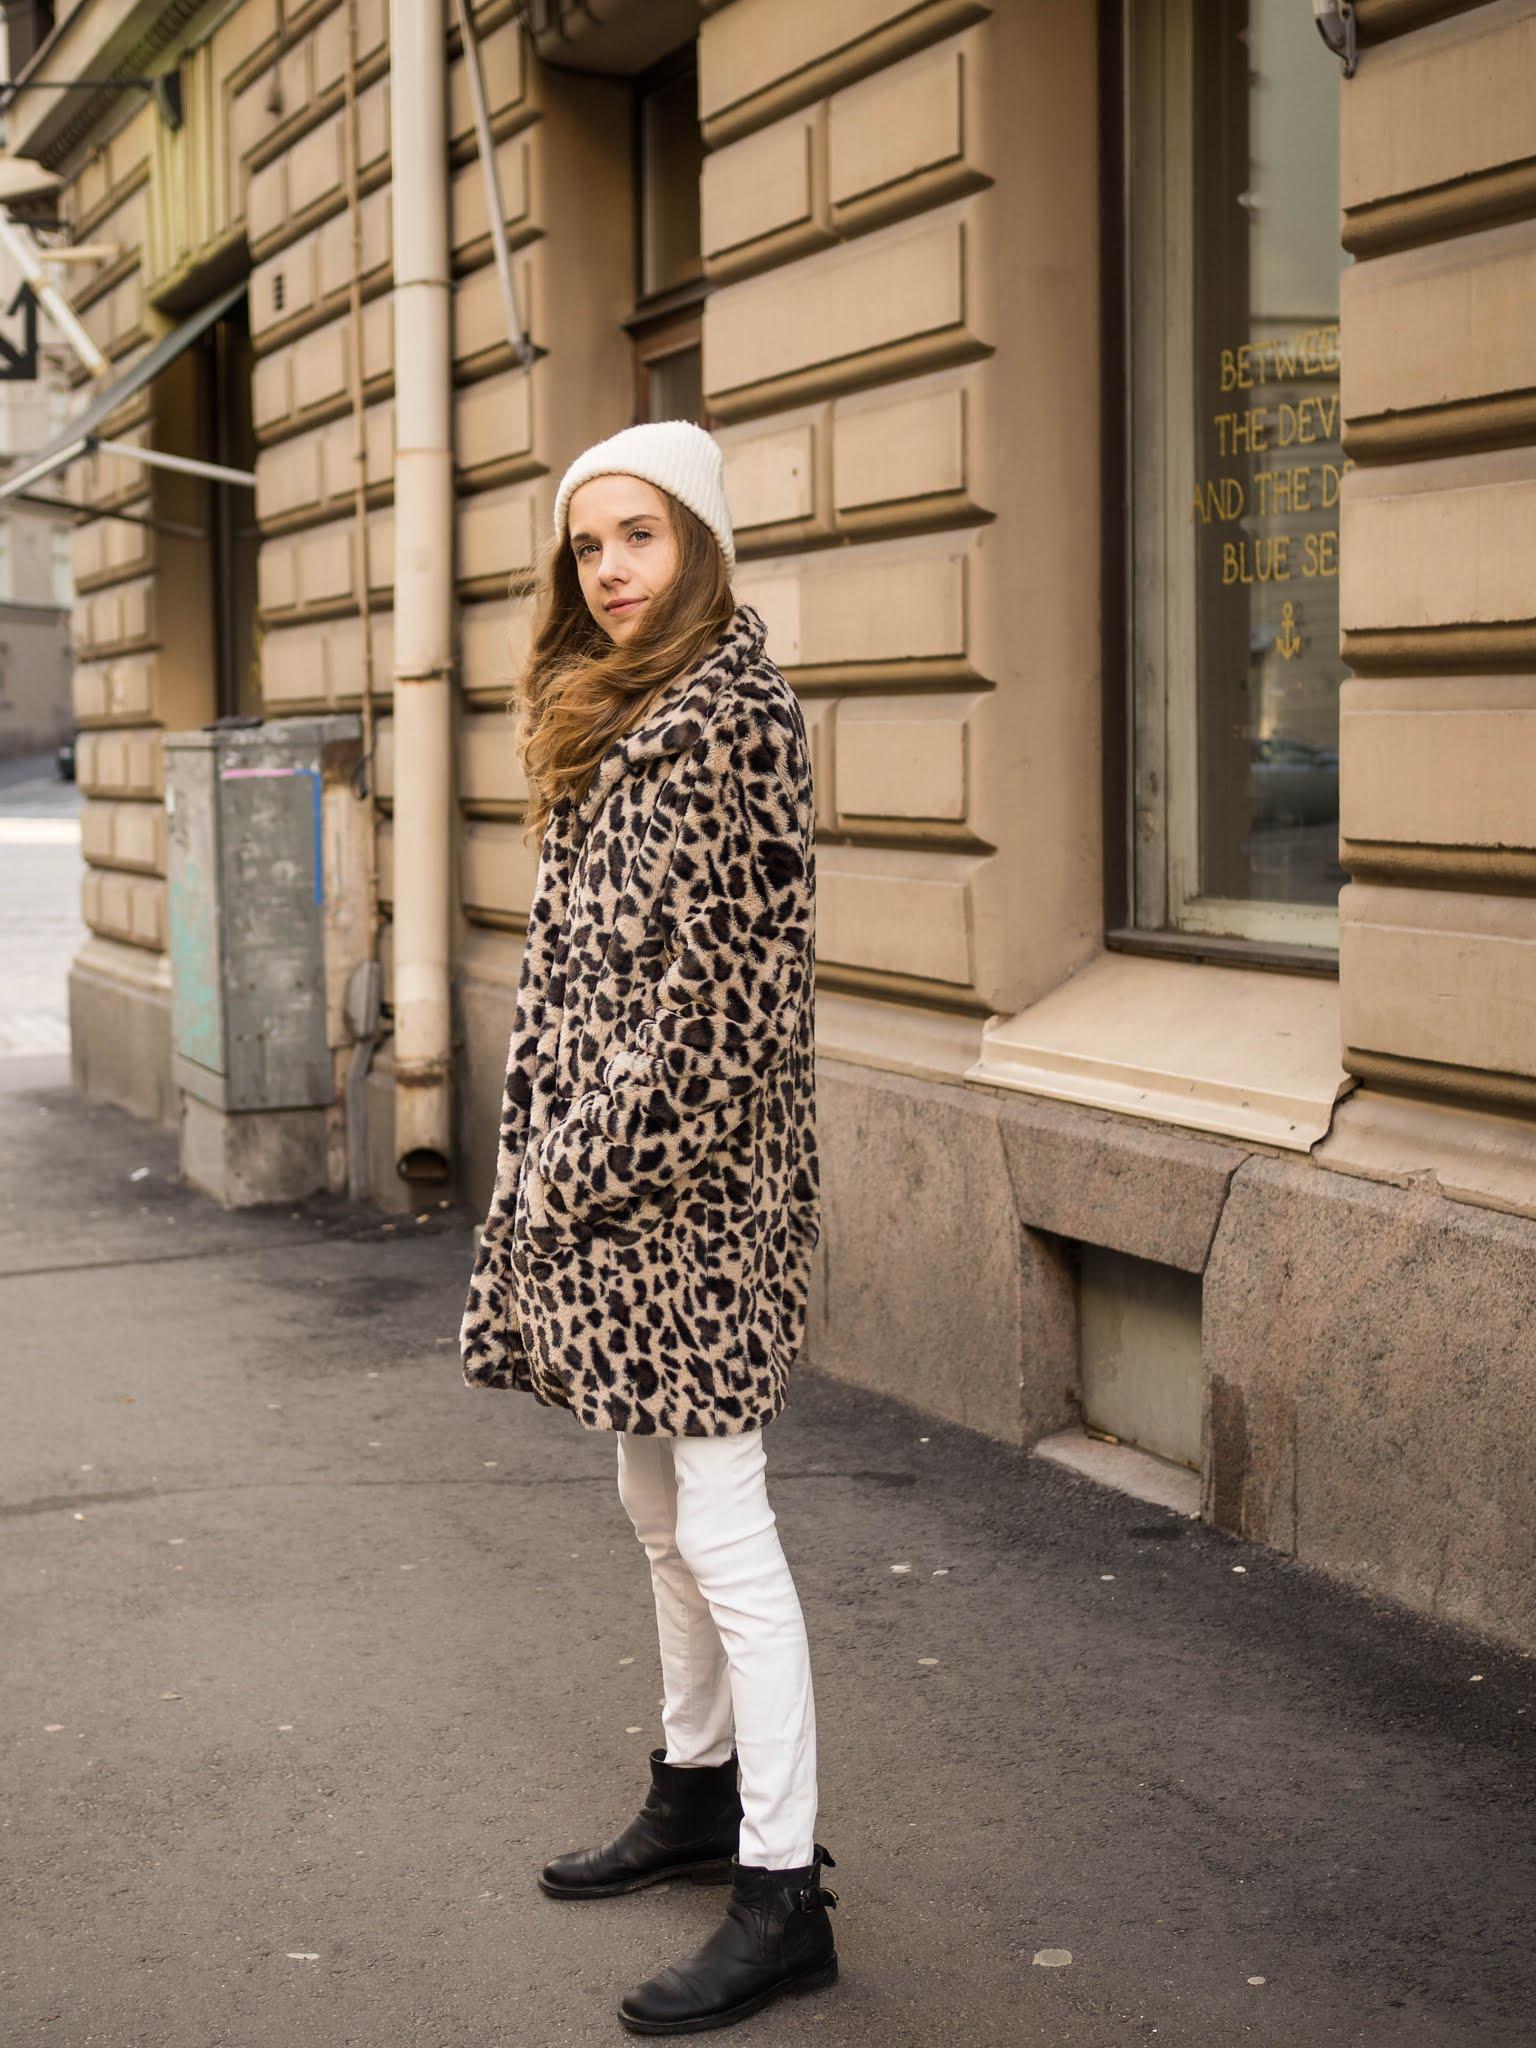 Winter outfit with leopard faux fur // Talviasu leopardiprintti tekoturkiksen kanssa